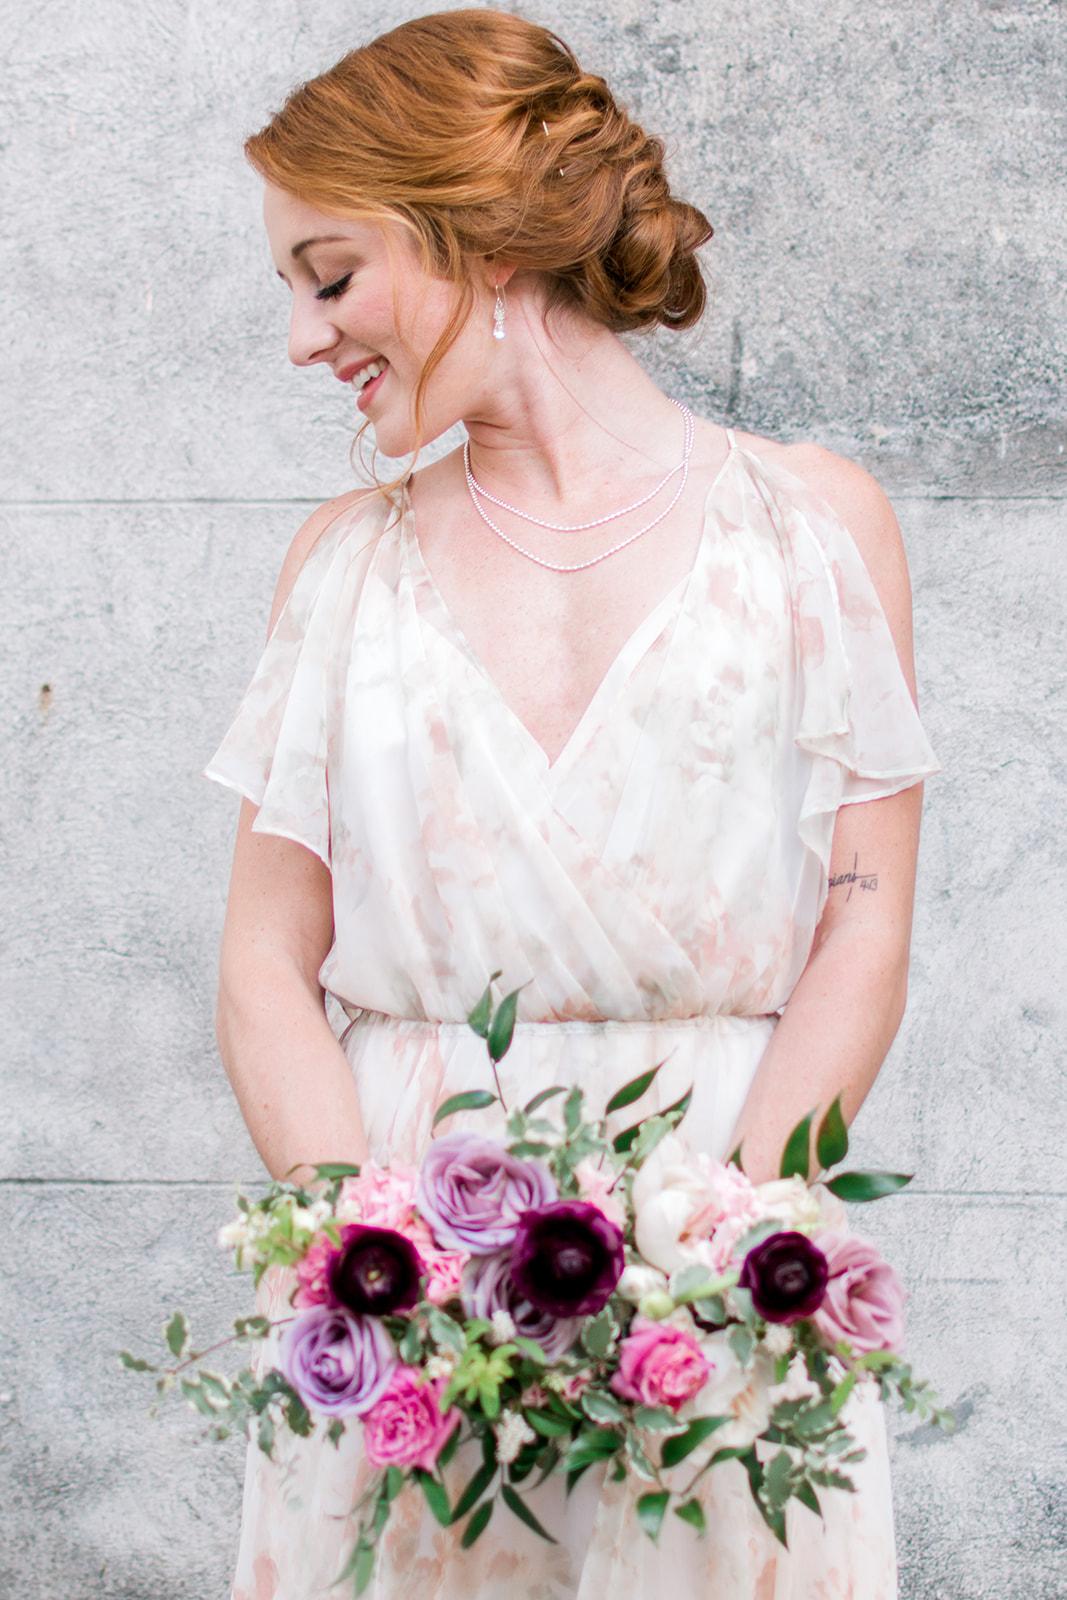 jenny-yoo-floral-print-bridesmaids-dresses-savannah-bridesmaids-dresses-savannah-bridal-shop-ivory-and-beau-savannah-weddings.jpg